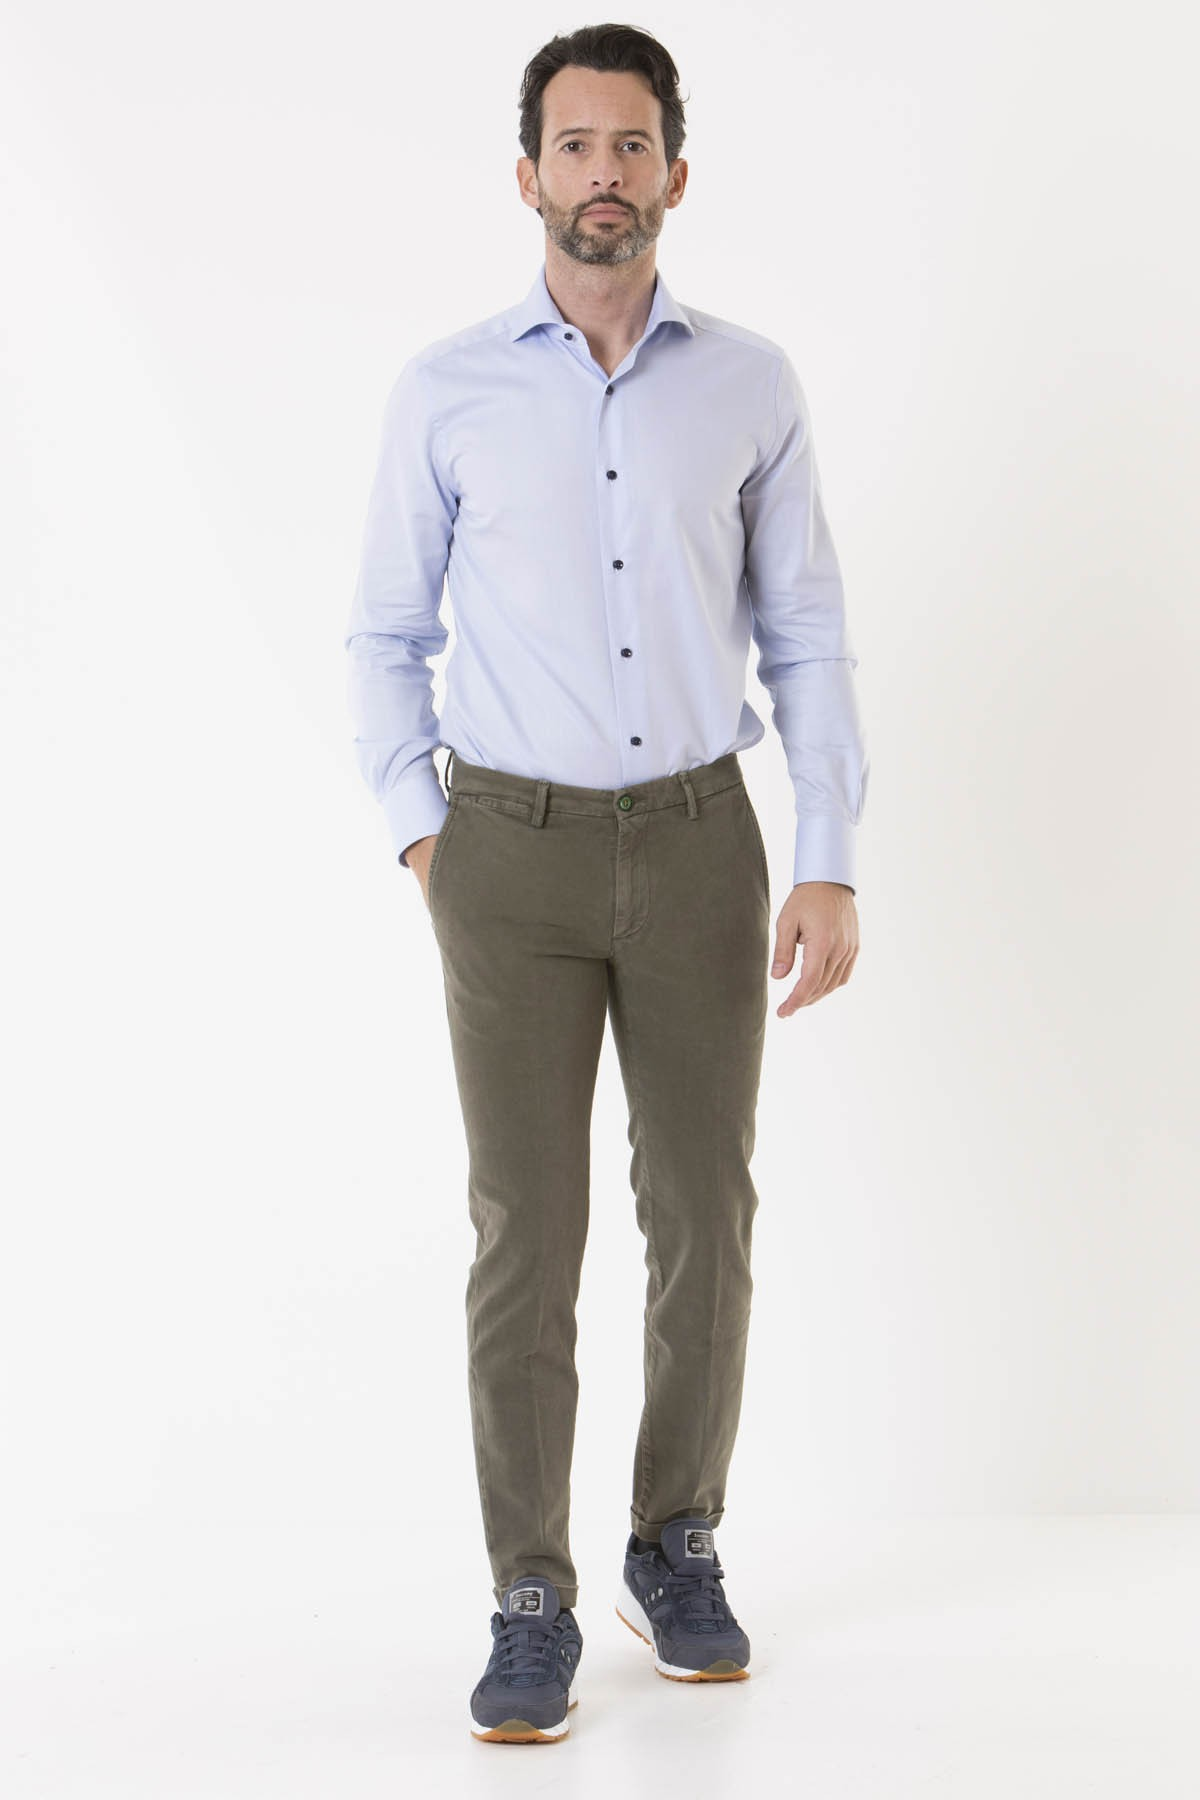 Pantaloni MUCHA per uomo RE-HASH A/I 18-19